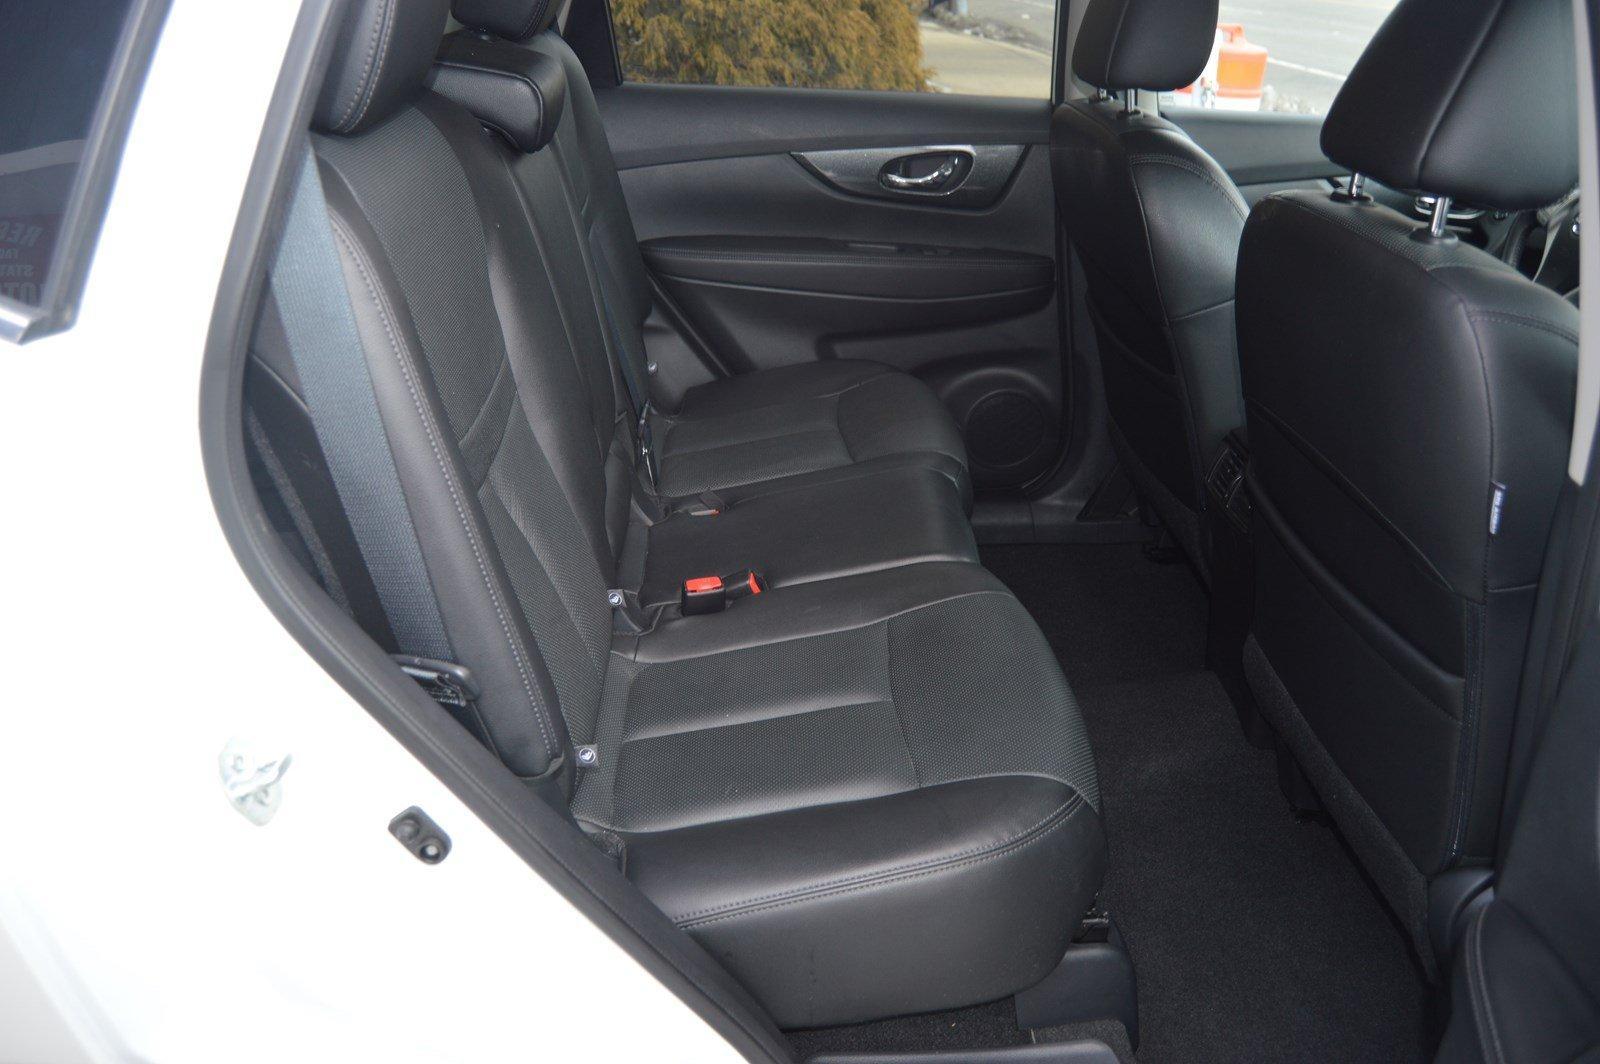 Used-2016-Nissan-Rogue-SL-Awd-(Navi,-Pano-Roof)